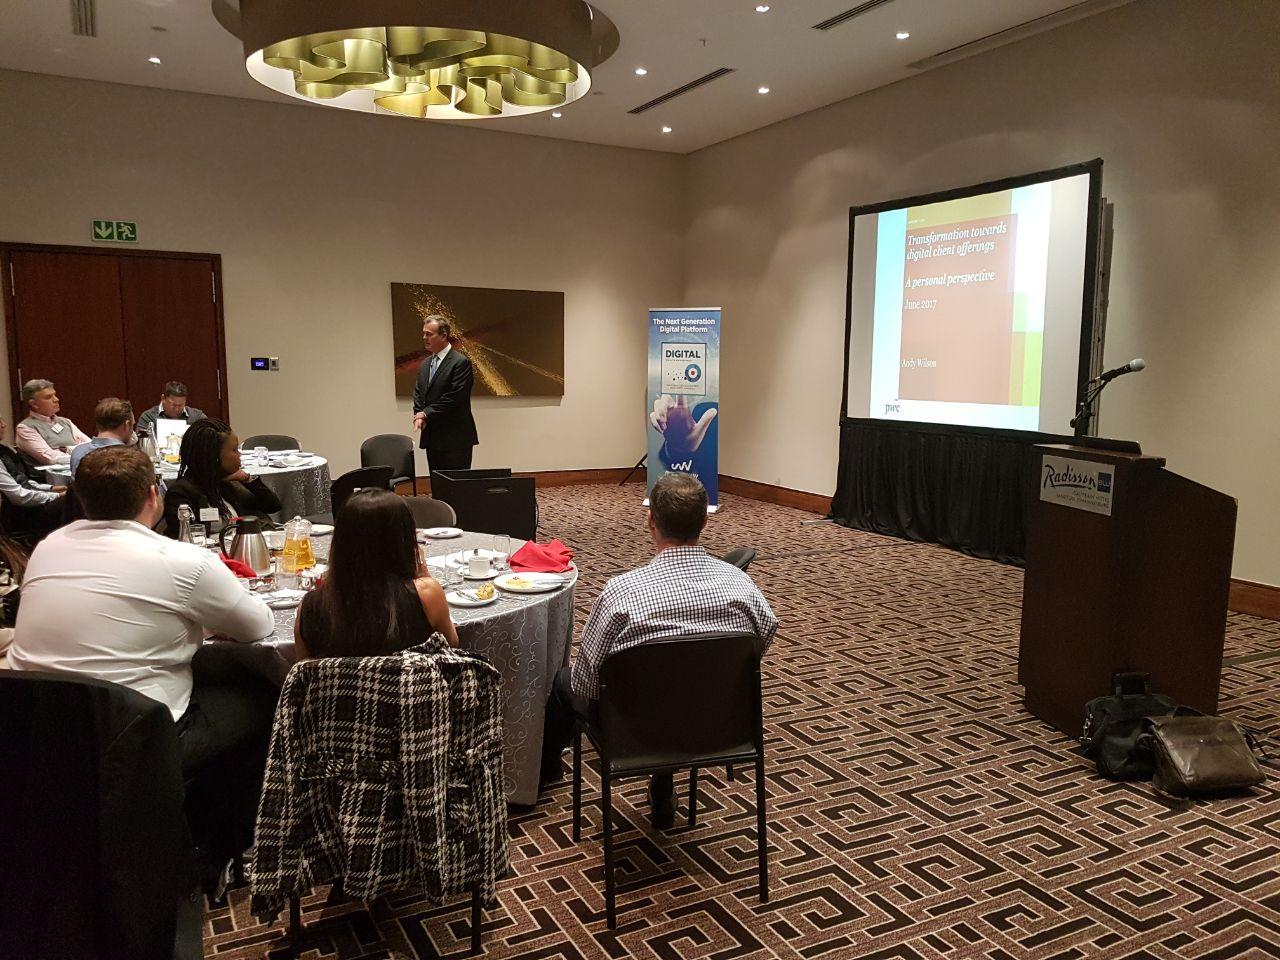 Andy Wilson is addressing Objectway's breakfast seminar on digitization of wealth management in Johannesburg #breakbrief https://t.co/5WP2dzNTu6